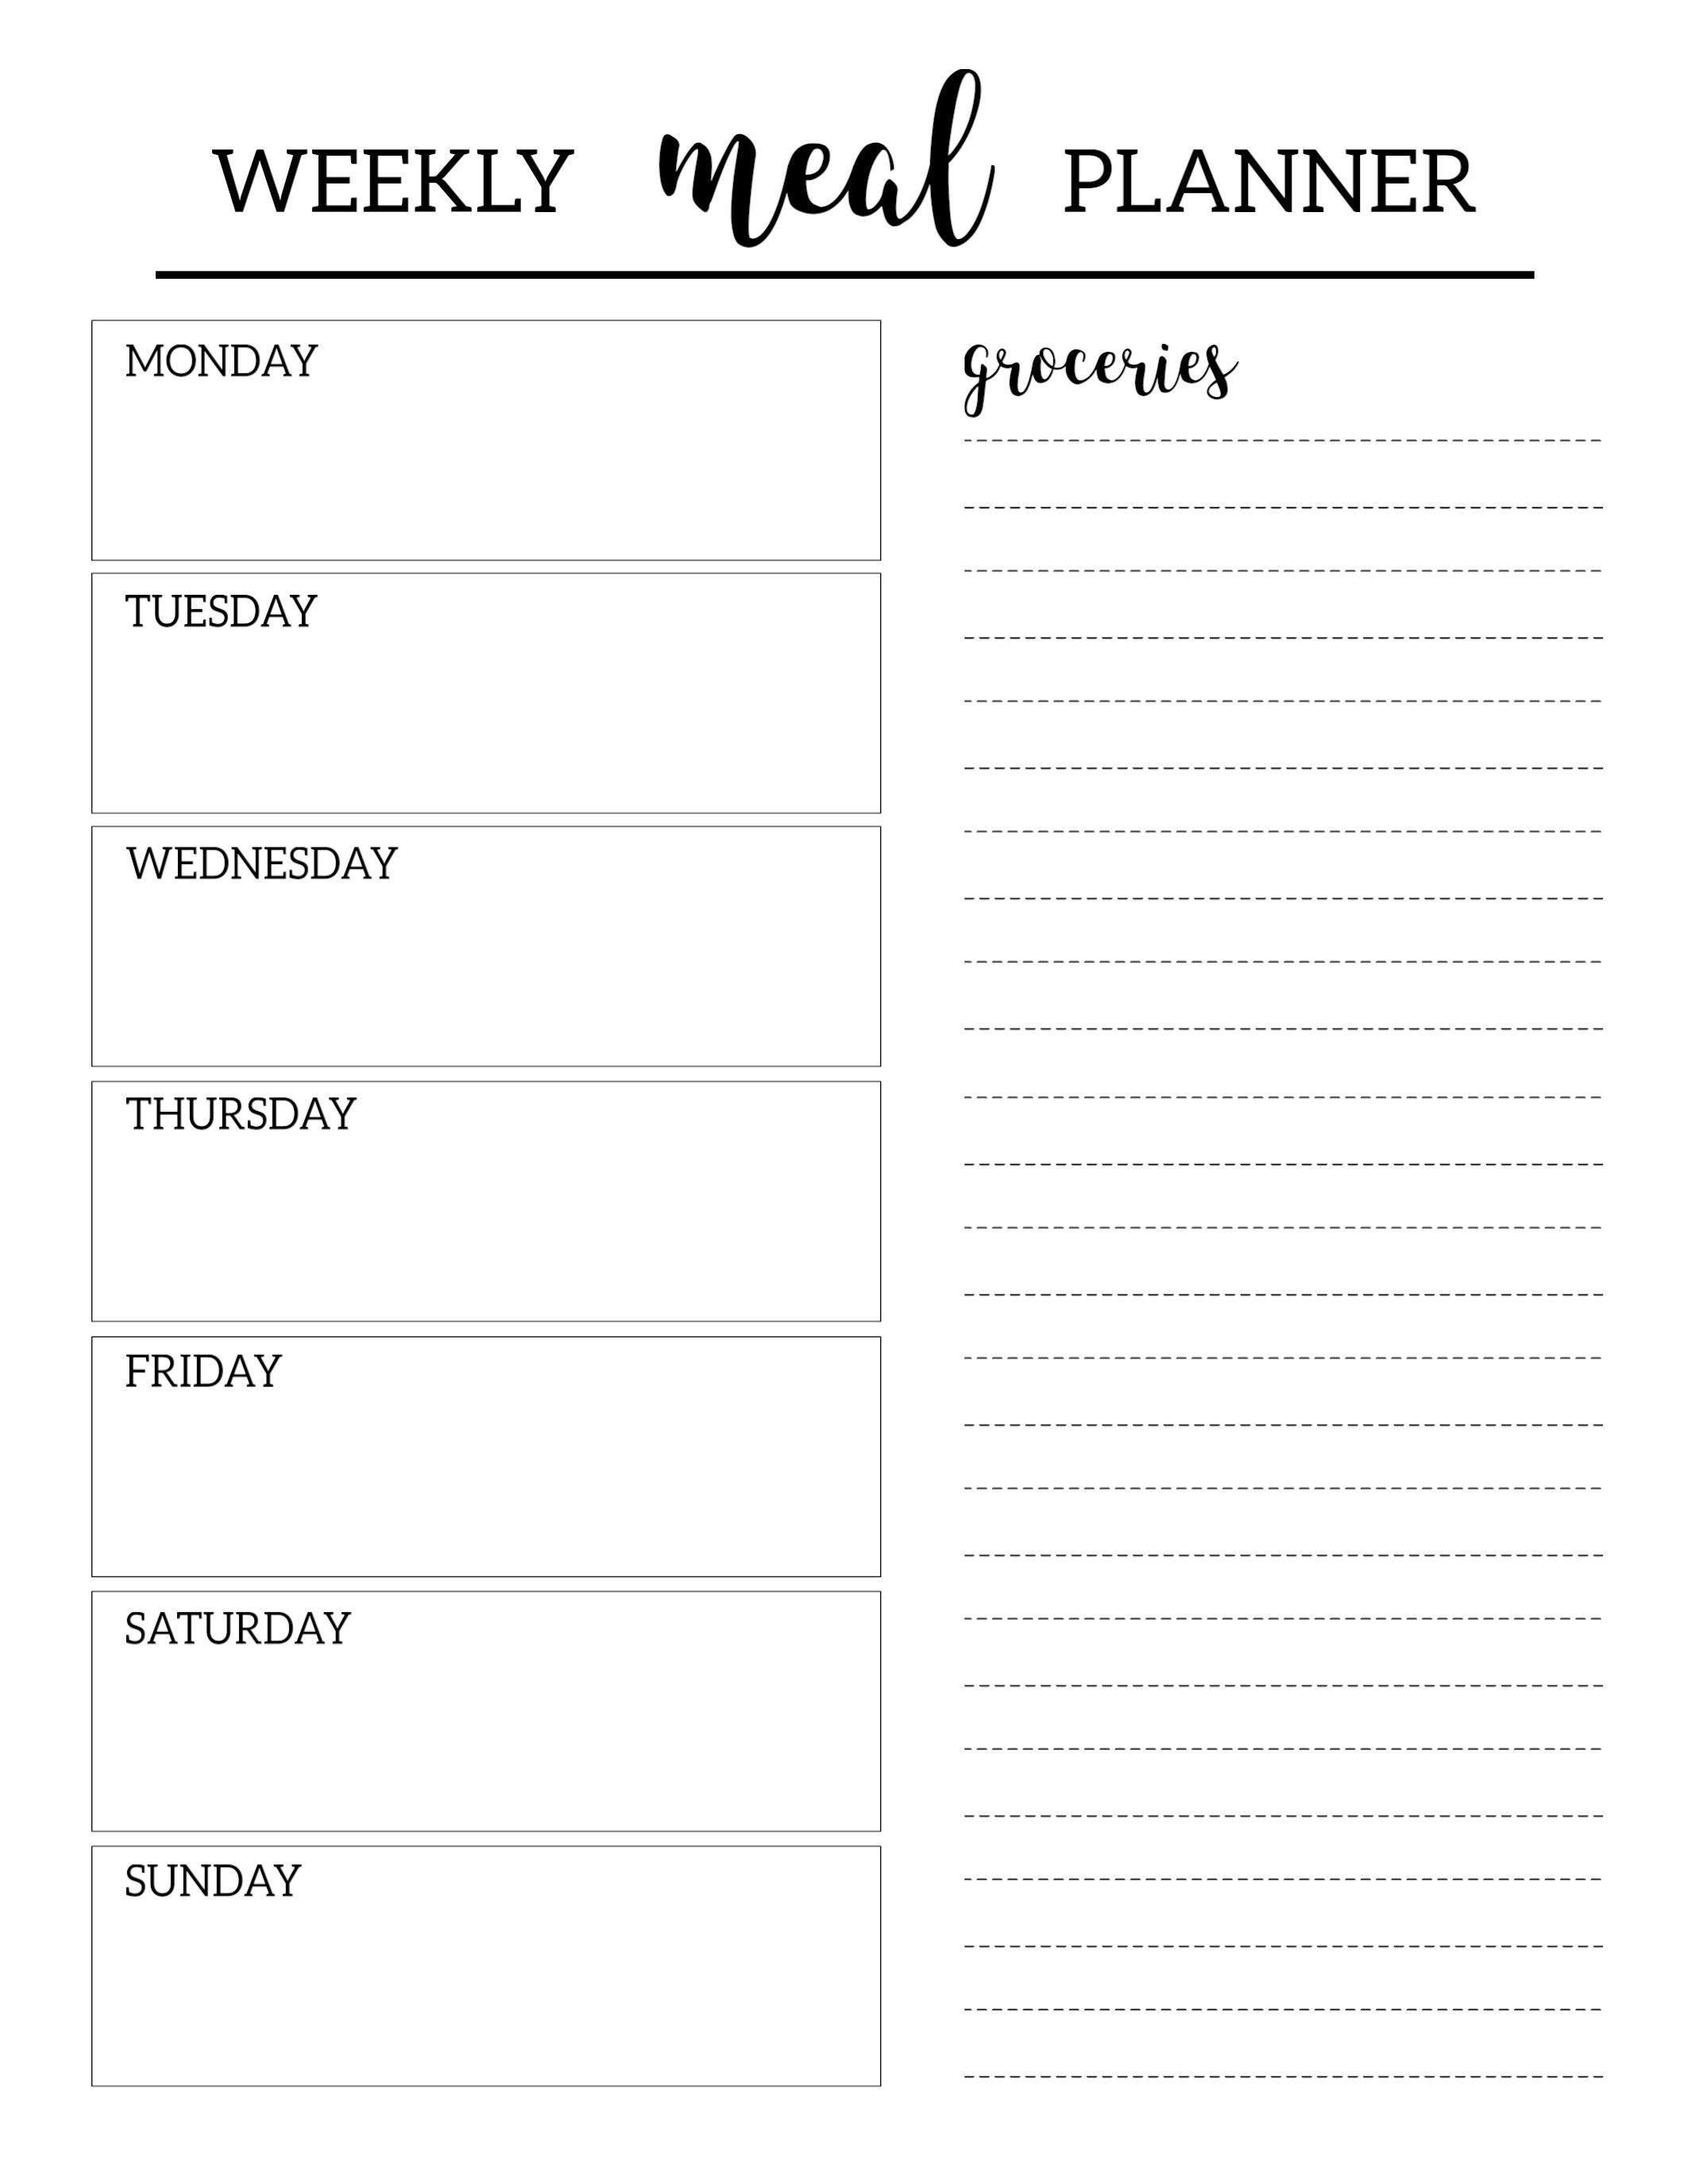 Weekly Dinner Menu Template Awesome Ideas Planner Word Plan Home With Free Printable Dinner Menu Template